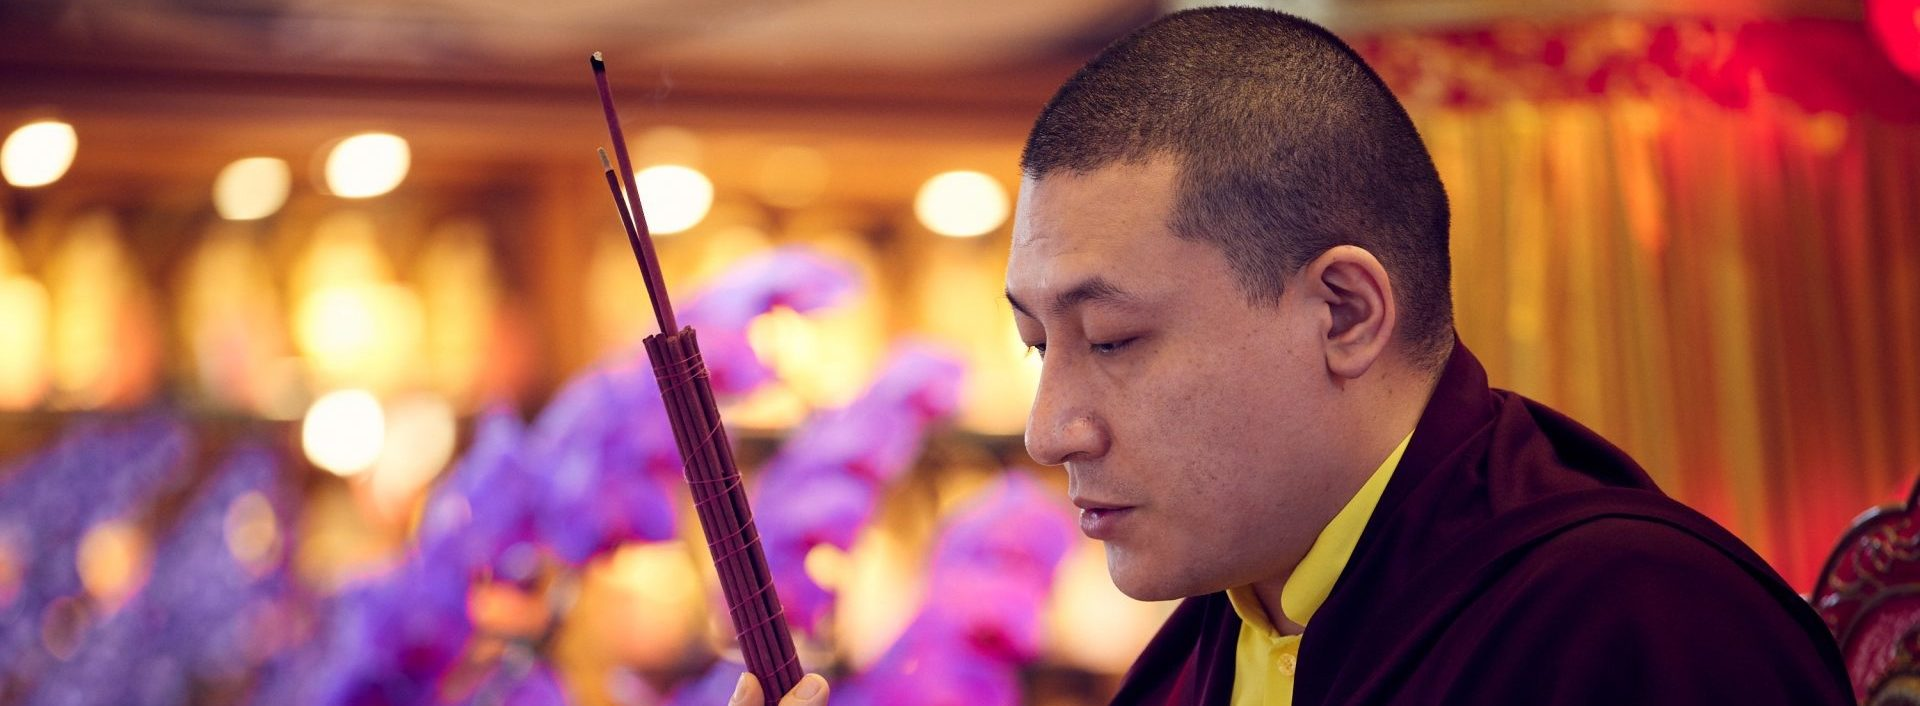 Thaye Dorje, His Holiness the 17th Gyawla Karmapa